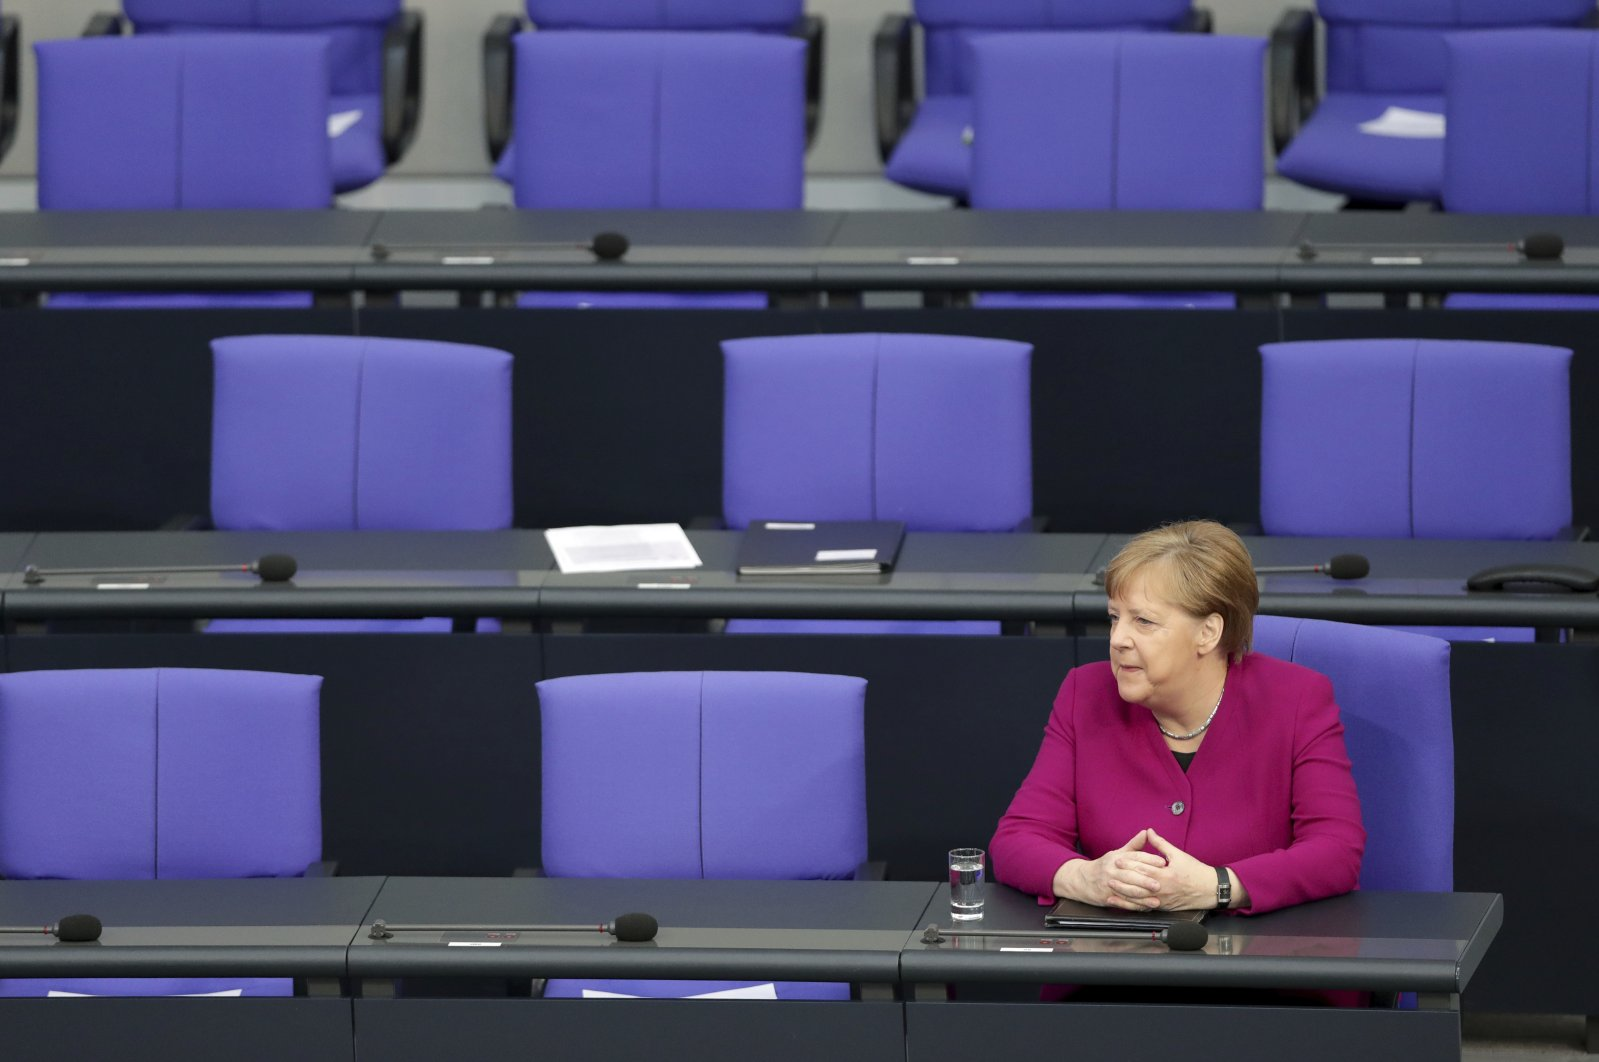 German Chancellor Angela Merkel attends a meeting of the German federal parliament, Bundestag, Berlin, Thursday, April 23, 2020. (AP Photo)